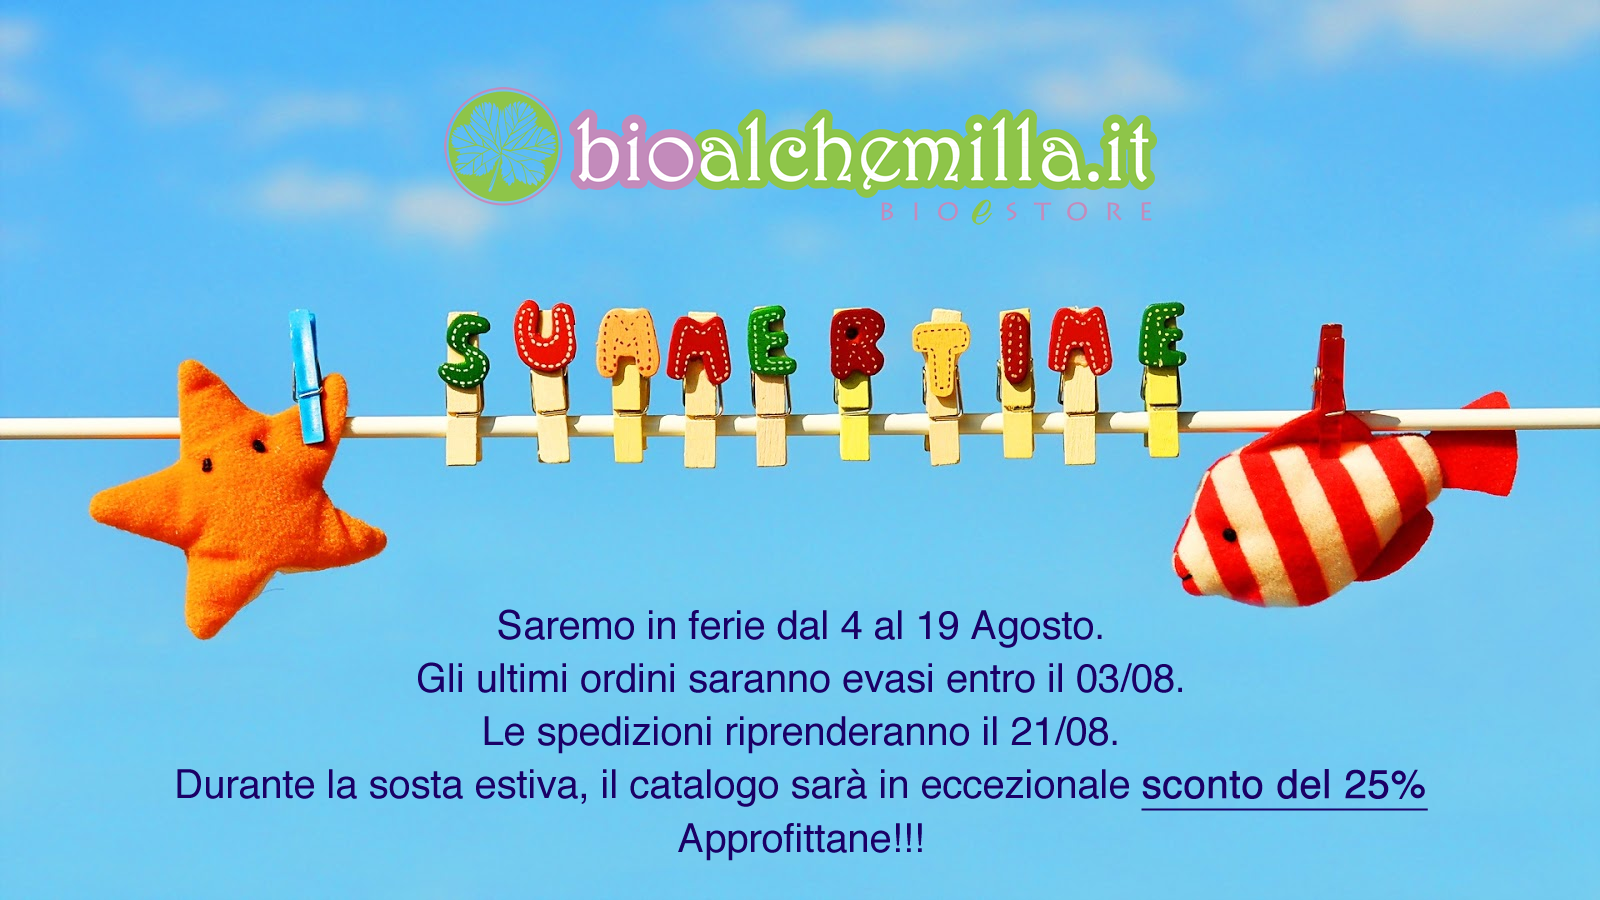 Sosta estiva 2018 - Bioalchemilla